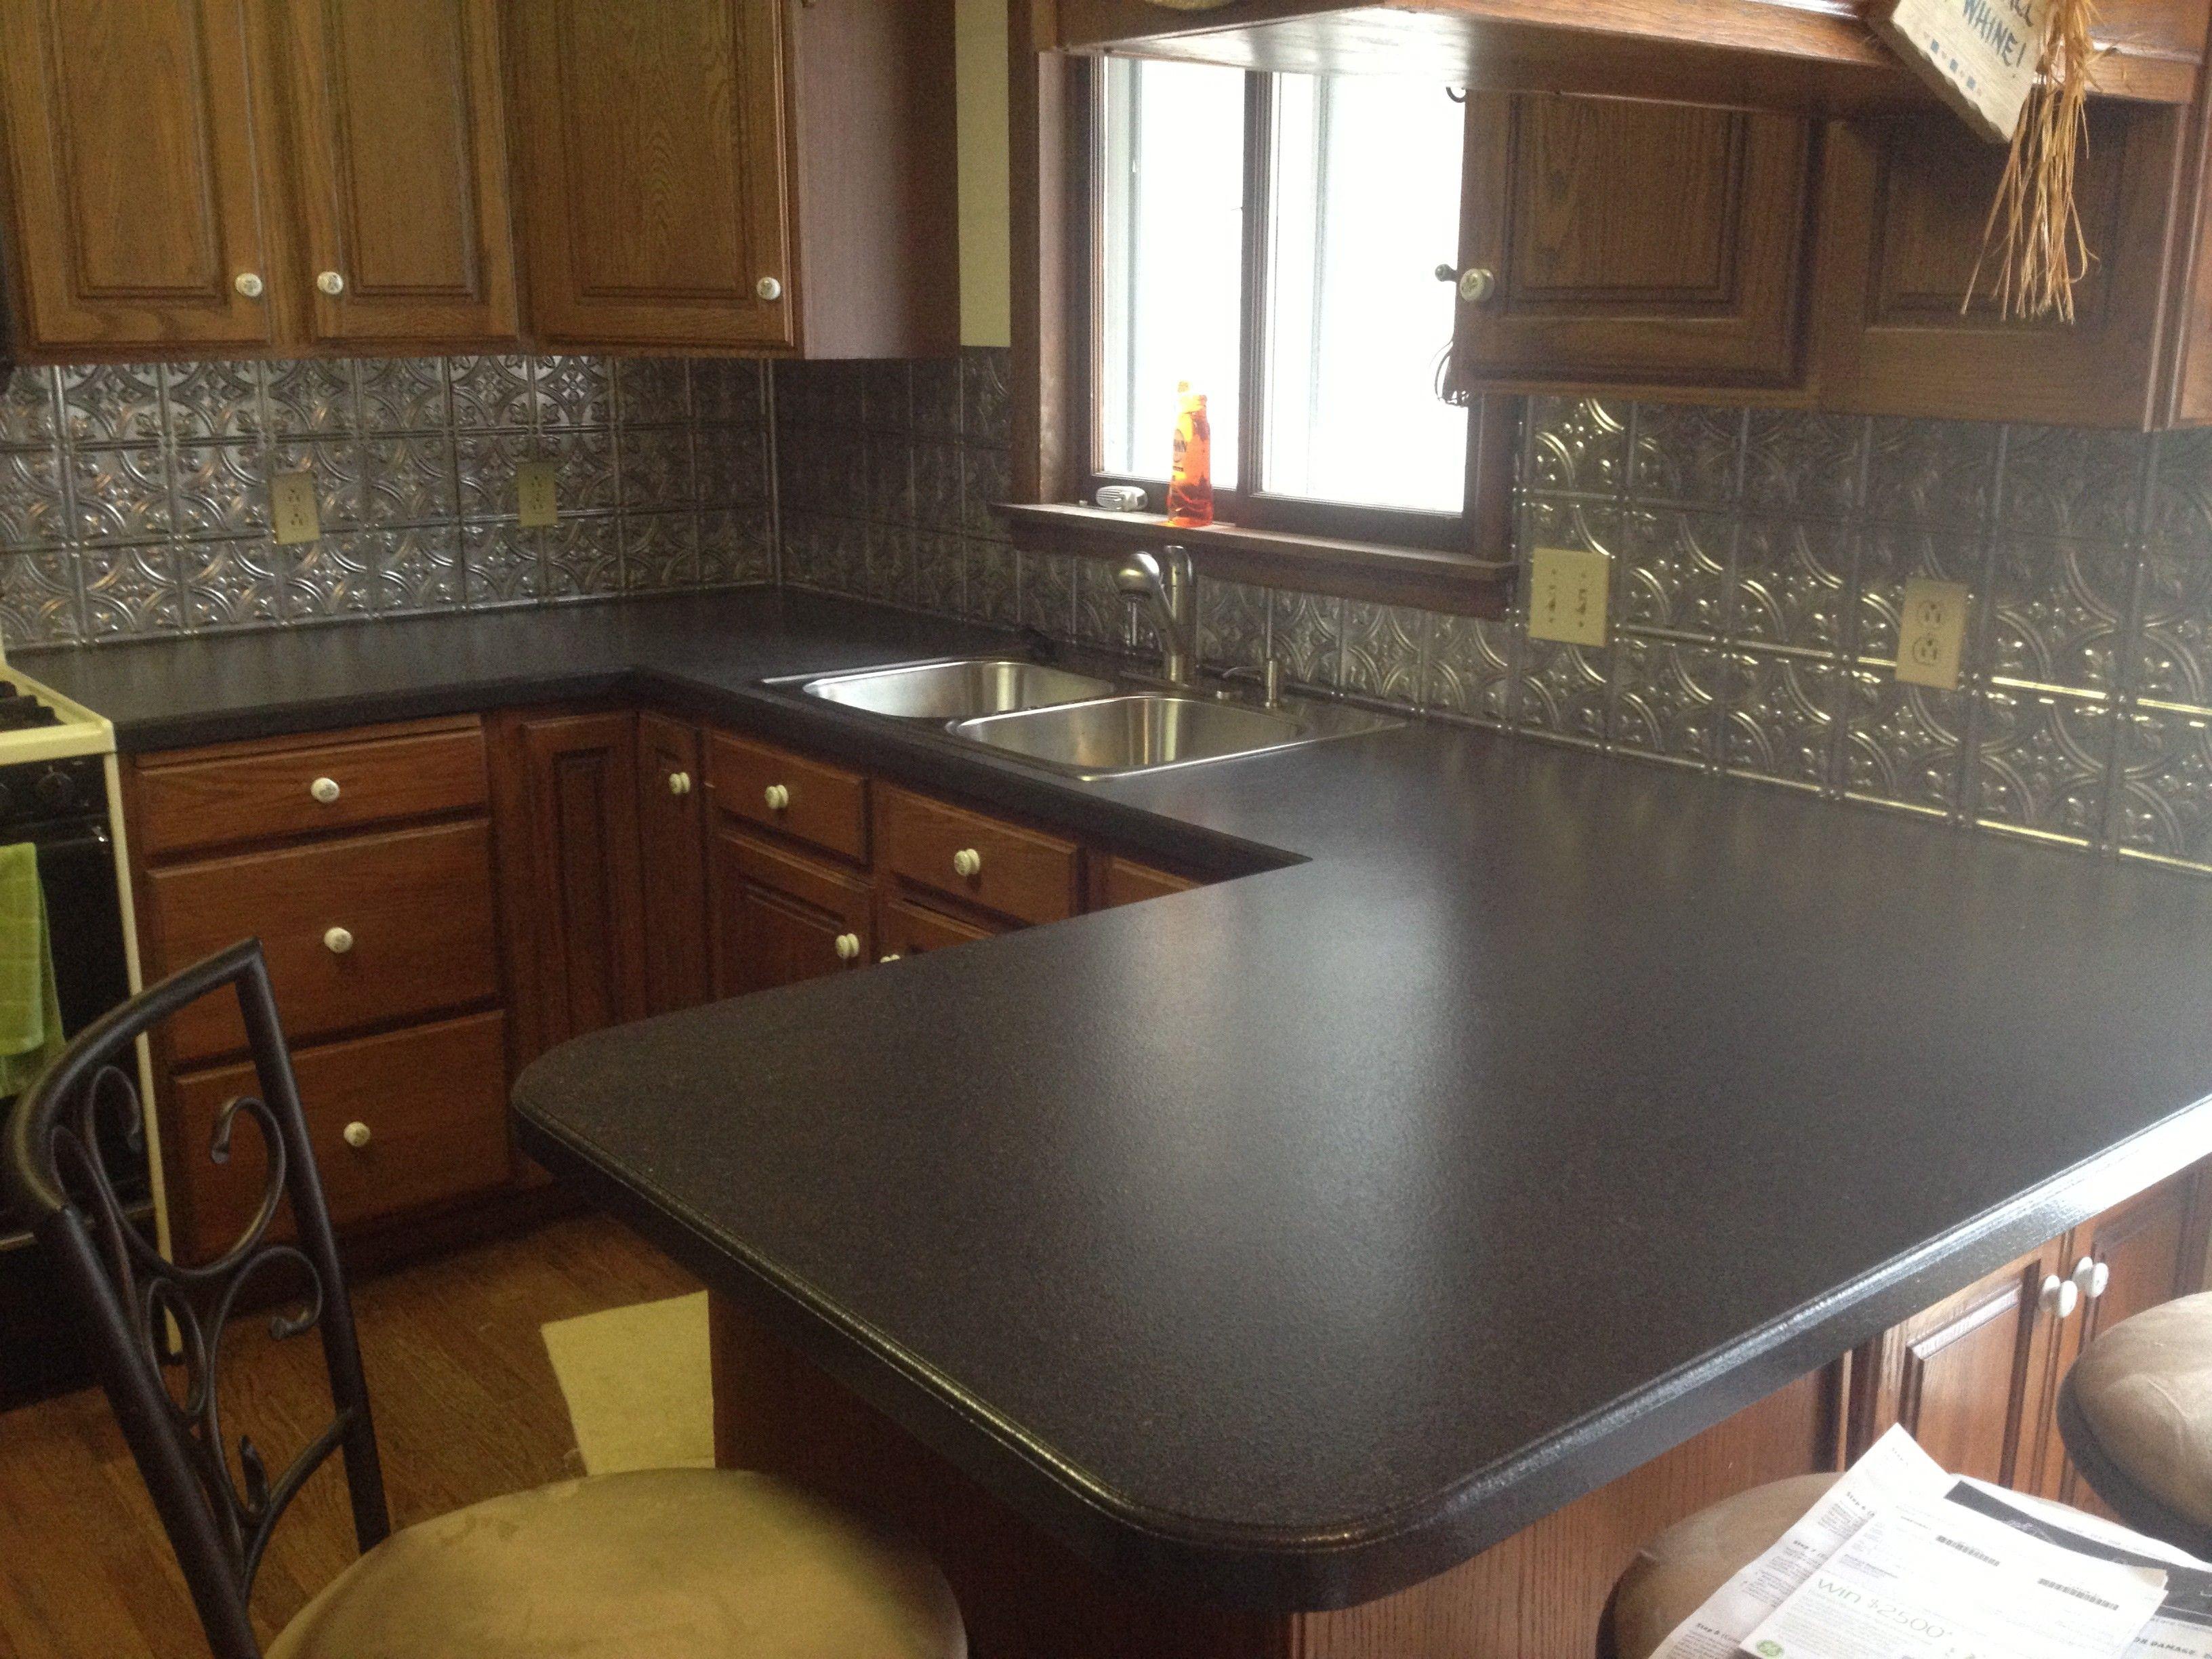 refinishing kitchen countertops and bathroom bathtub reglazing phoenix az napco